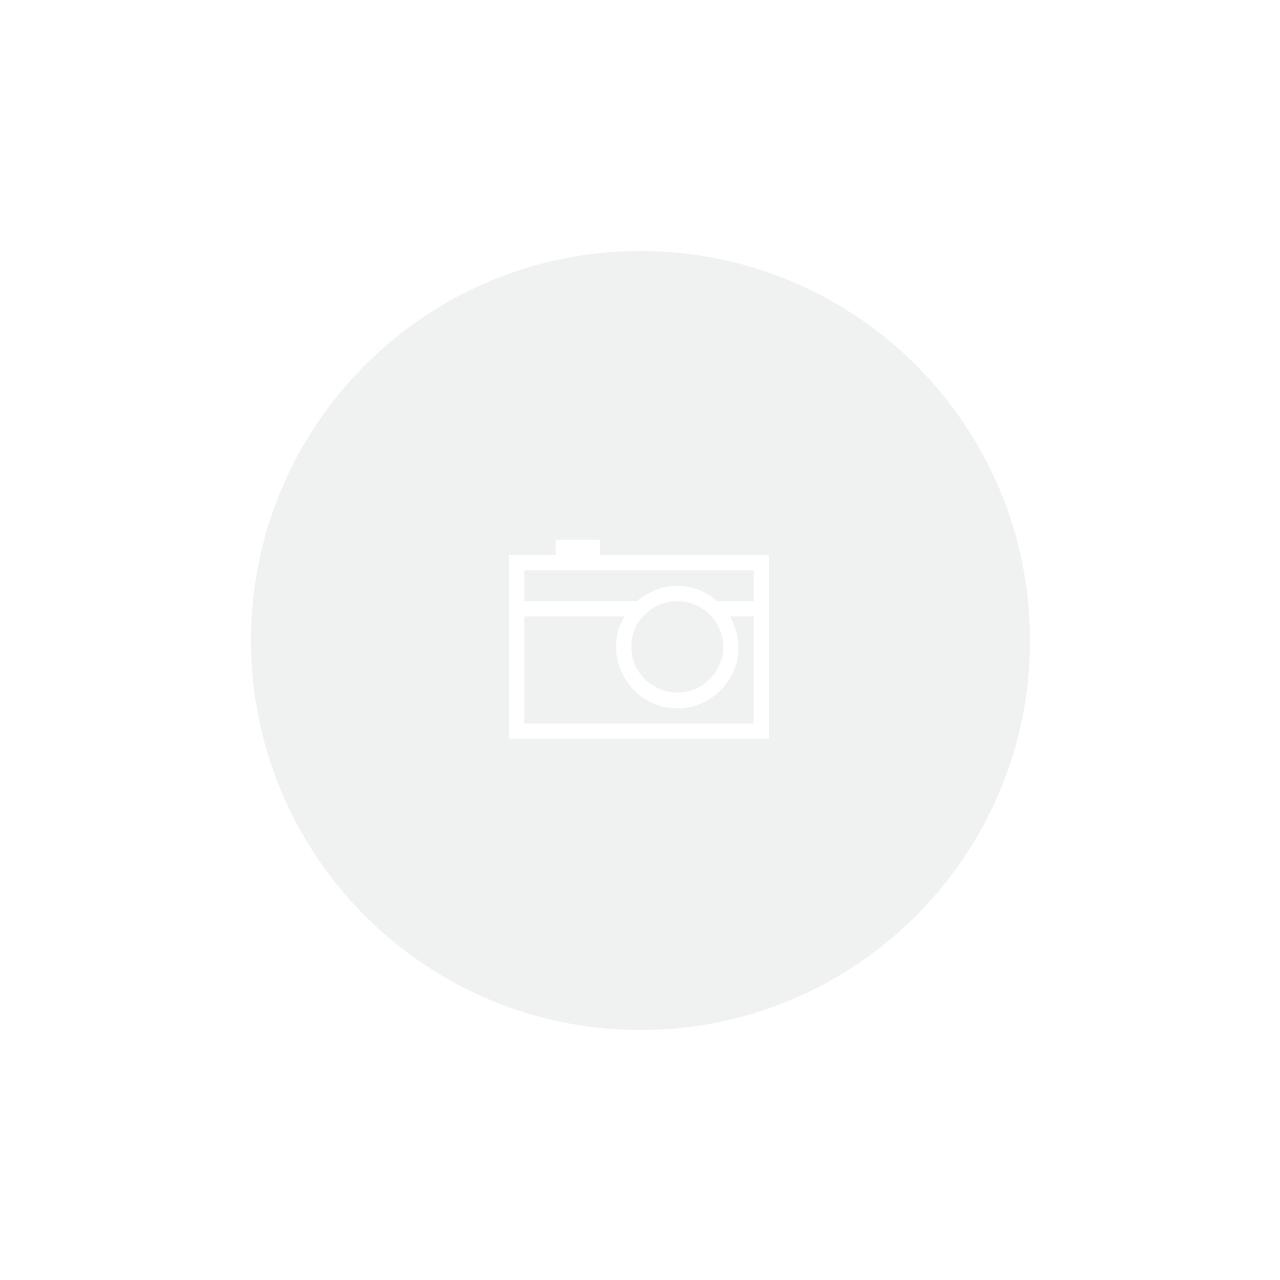 Fôrma para Torta e Bolo Antiaderente 22 cm Brasil Tramontina